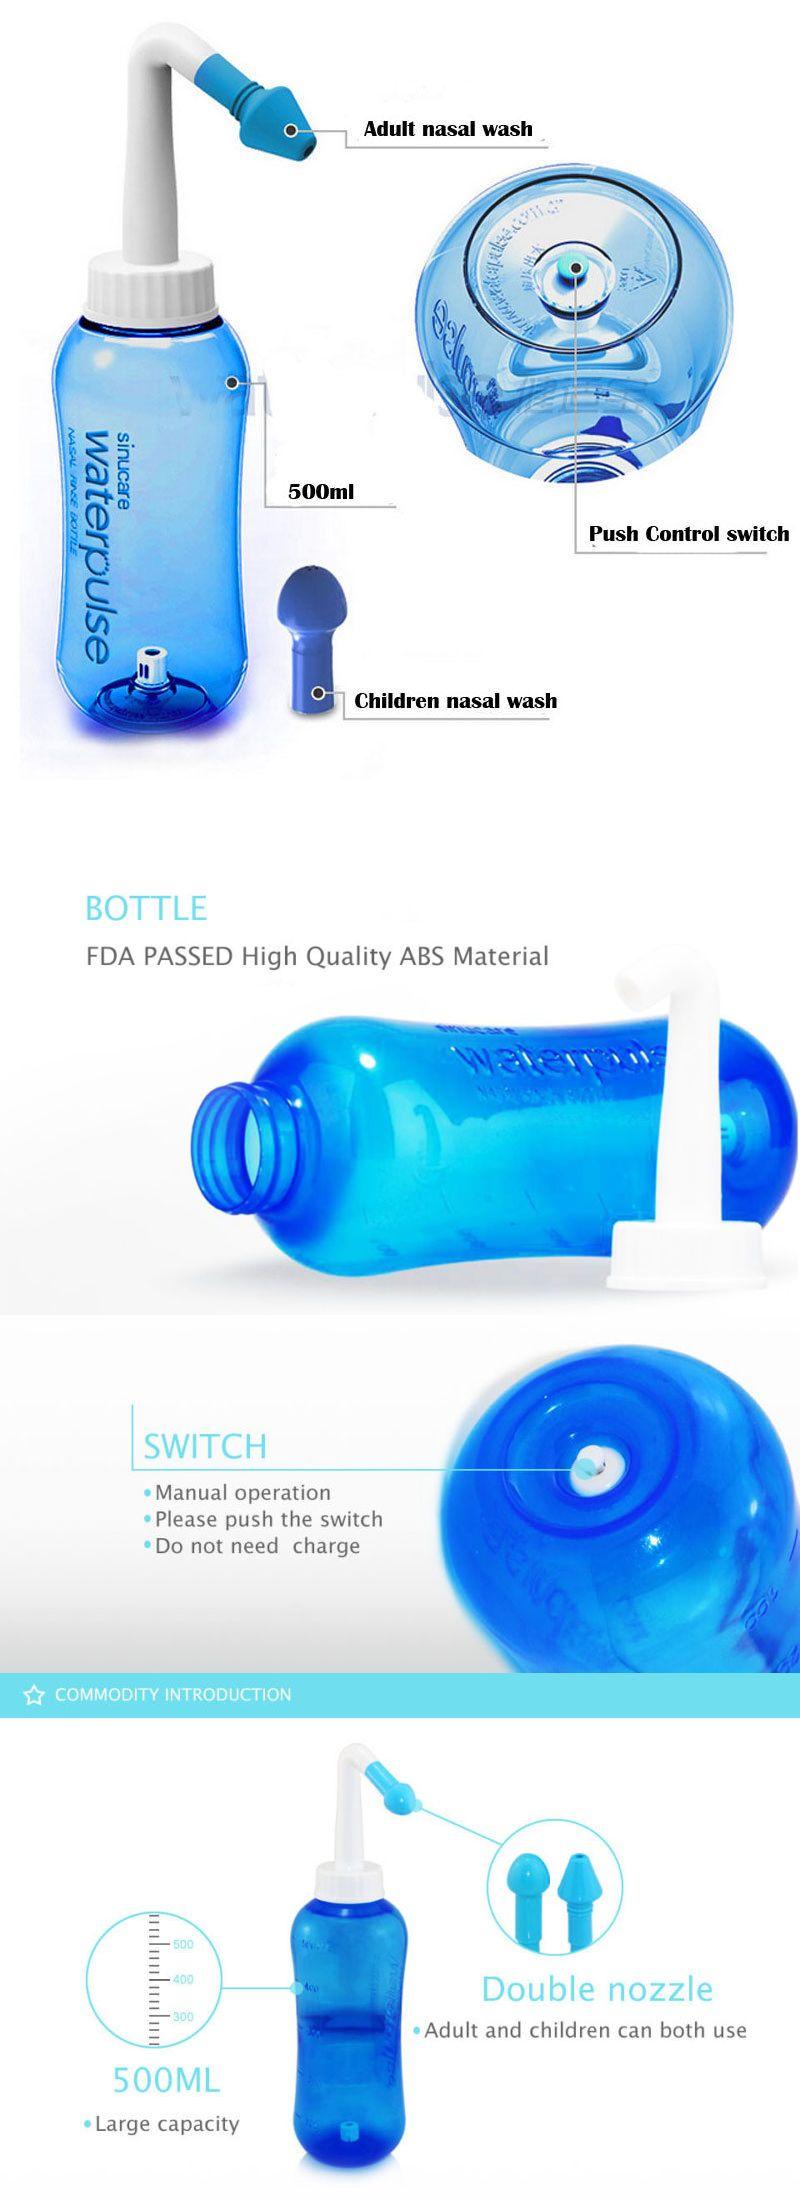 Neti Pots and Cleansers 159882 Nasal Pressure Rinse Neti